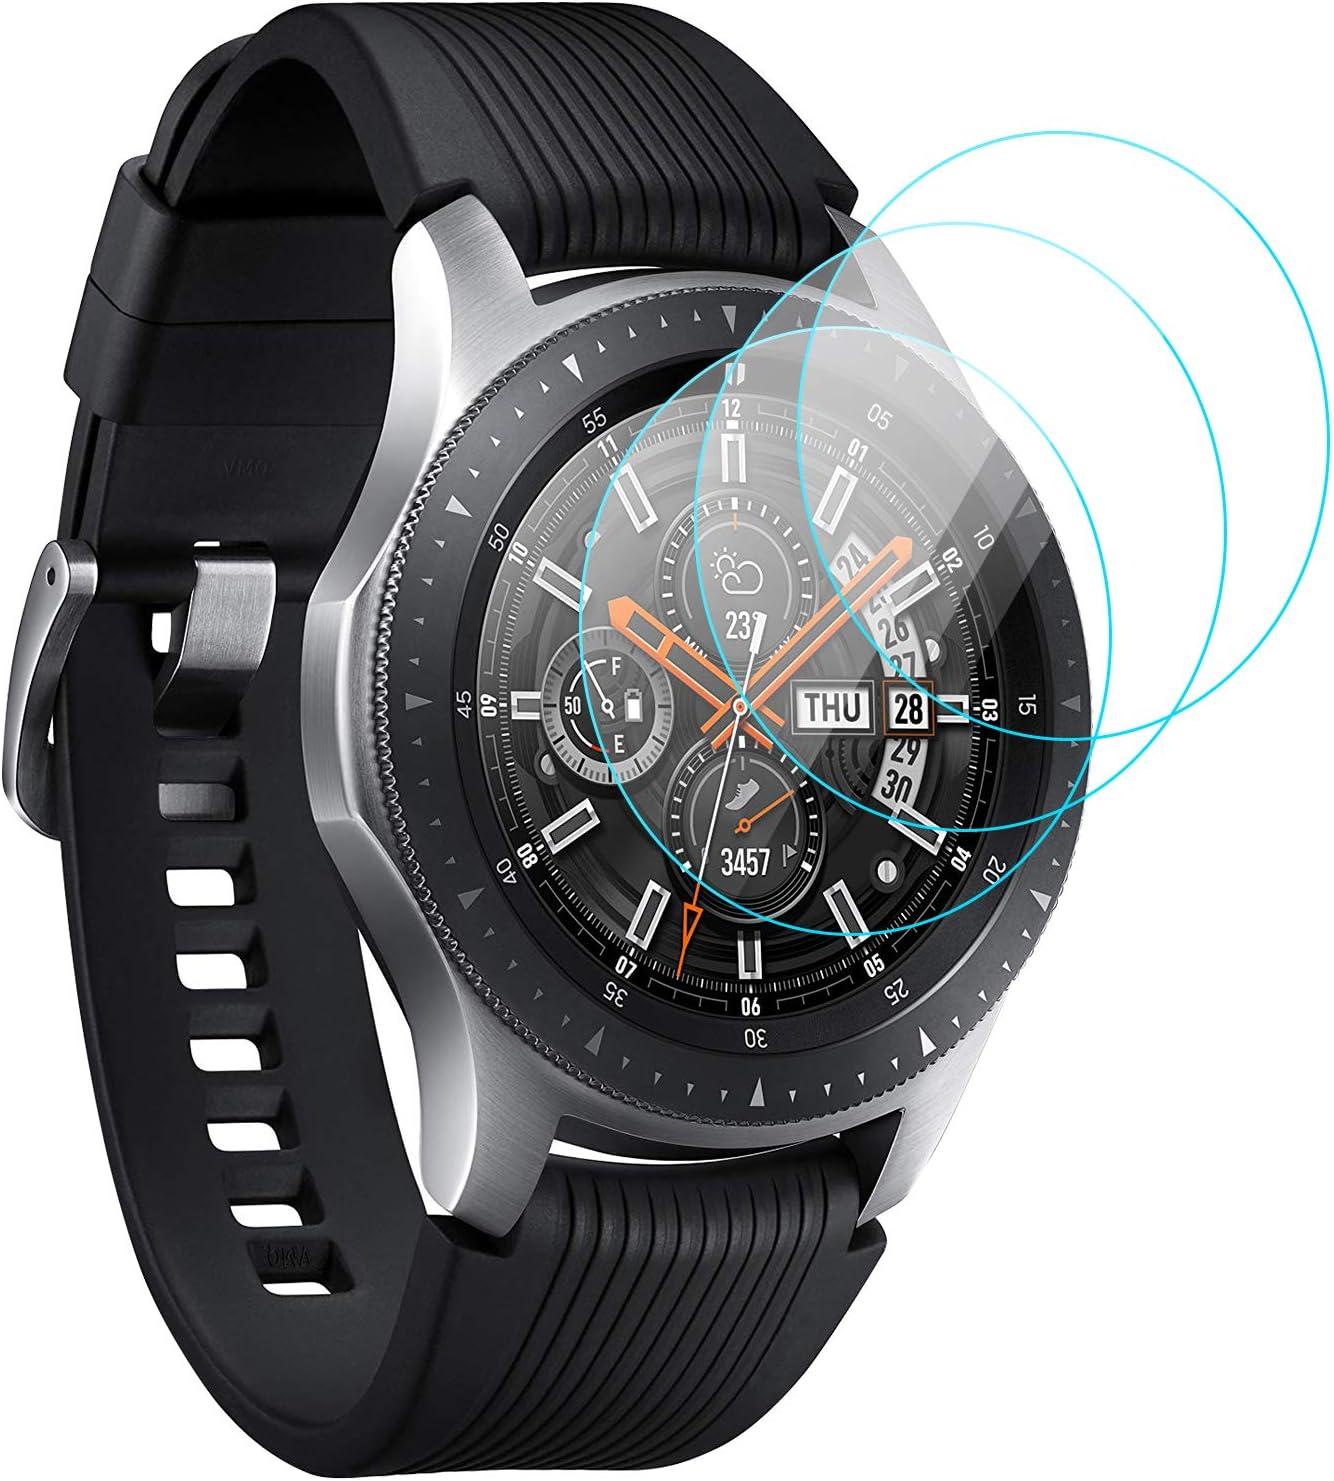 KIMILAR Pantalla Compatible con Samsung Galaxy Watch 46mm / Gear S3 Protector Pantalla, Templado Vidrio Compatible con Galaxy Watch 46mm & Gear S3 Frontier/Classic - 9H Dureza Anti-rasguñe